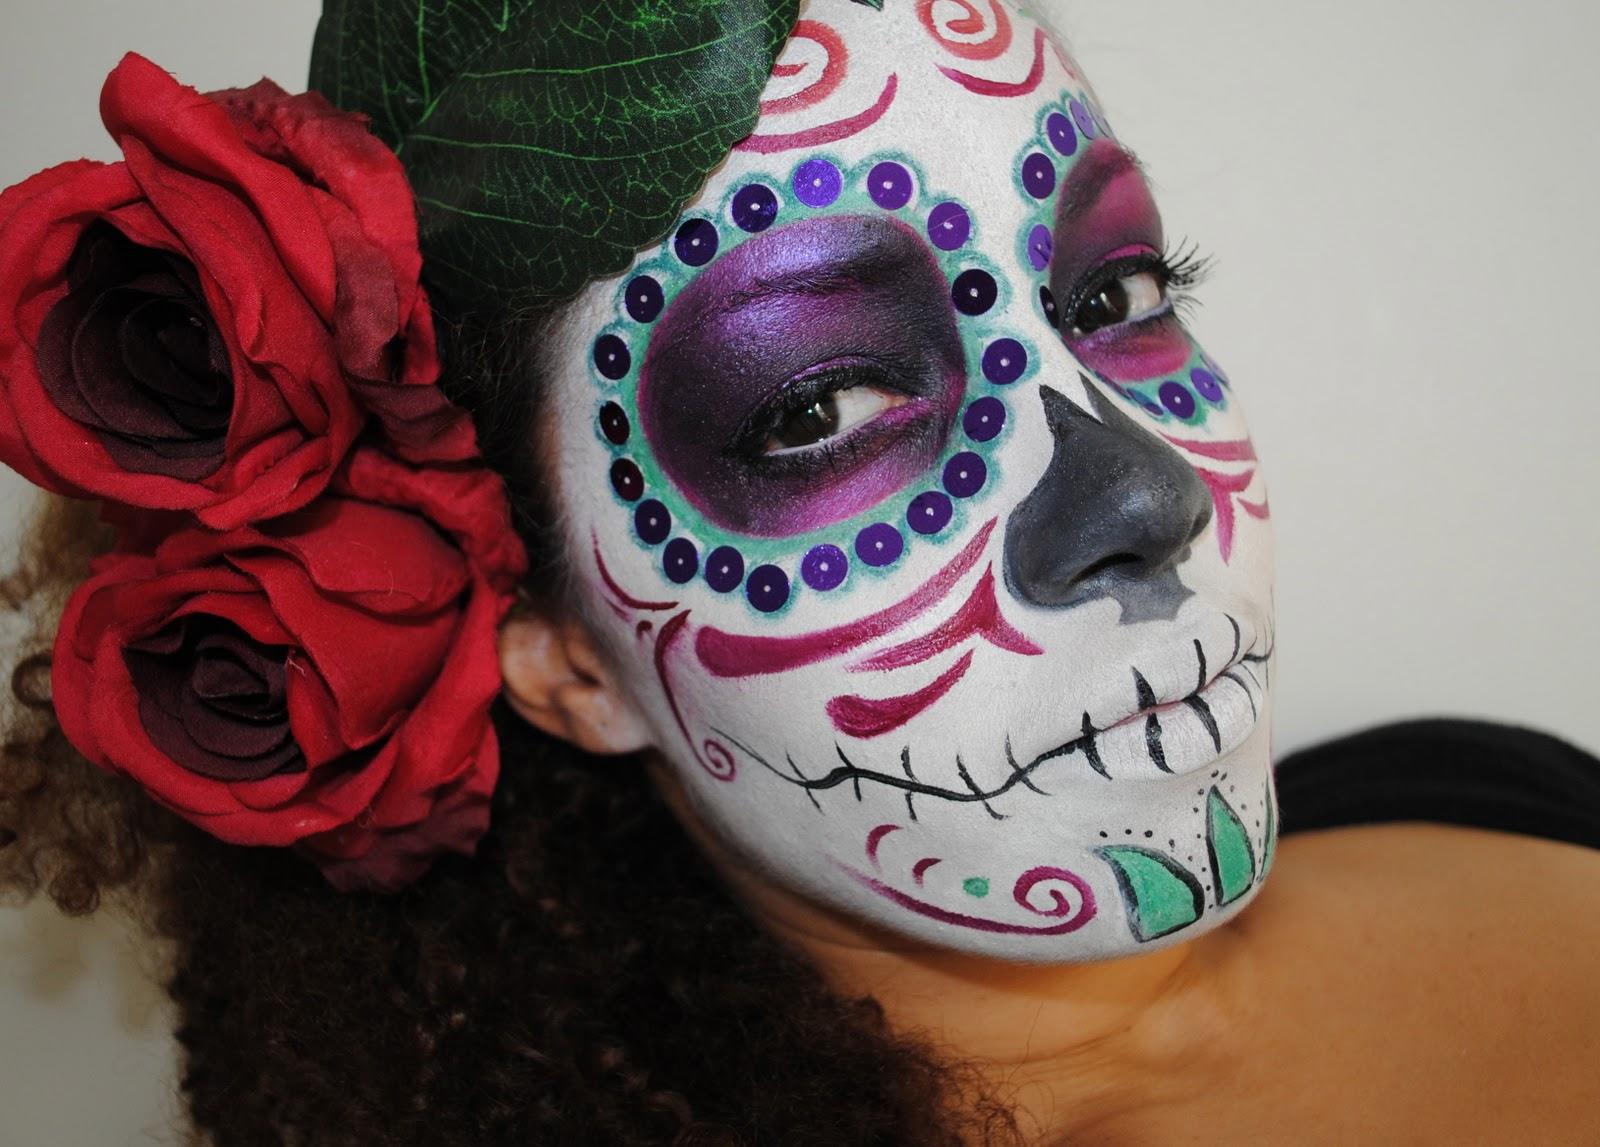 amivi make up tutorial maquillage halloween. Black Bedroom Furniture Sets. Home Design Ideas